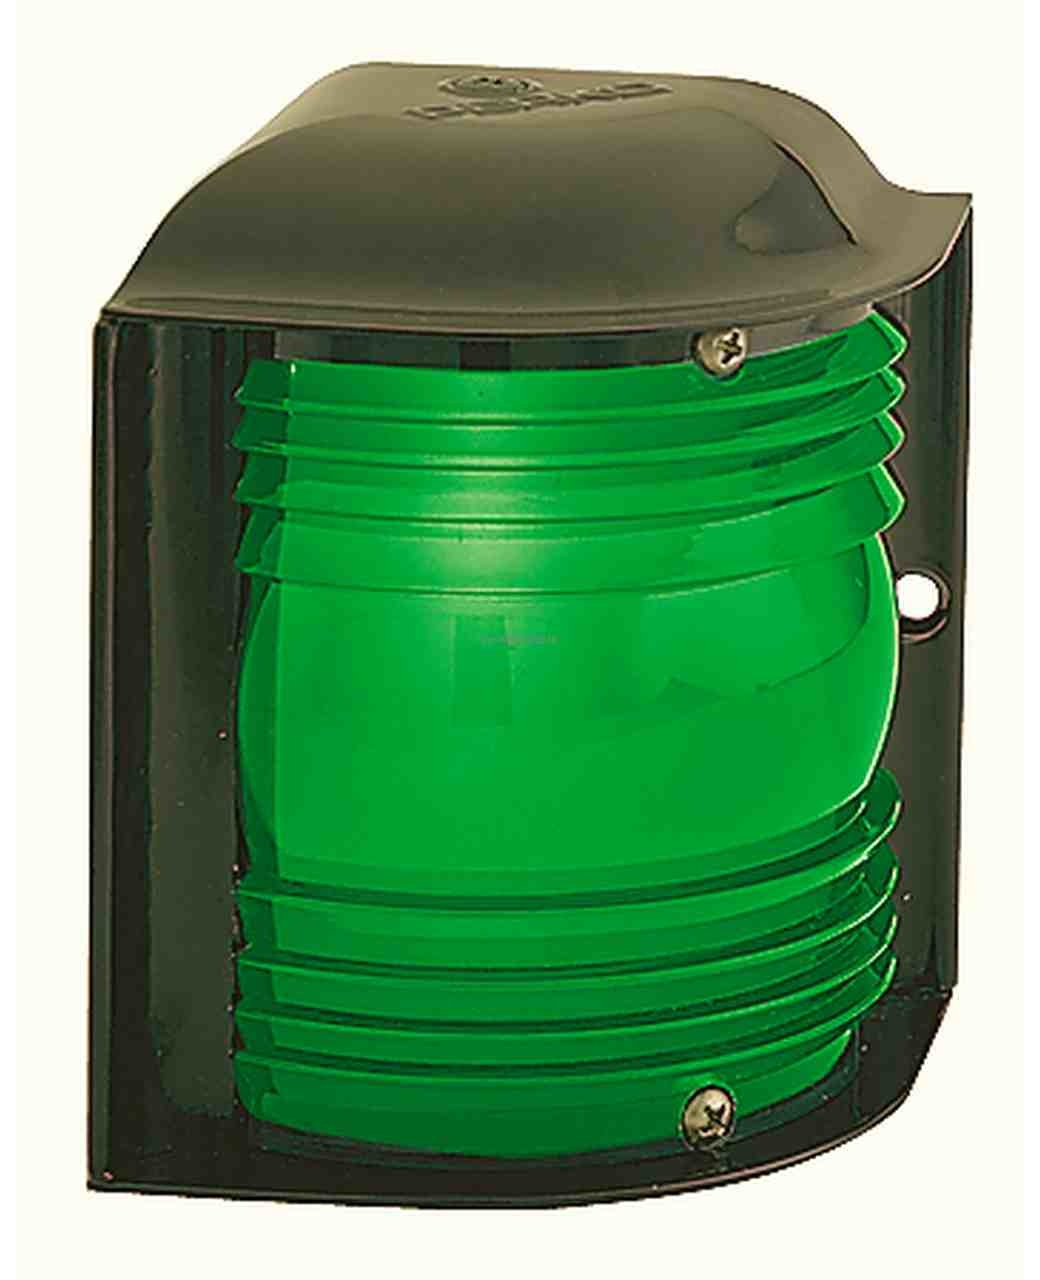 Perko 12 - 24 VDC Green Side Light - horizontal mounting (Bulb Not Included)